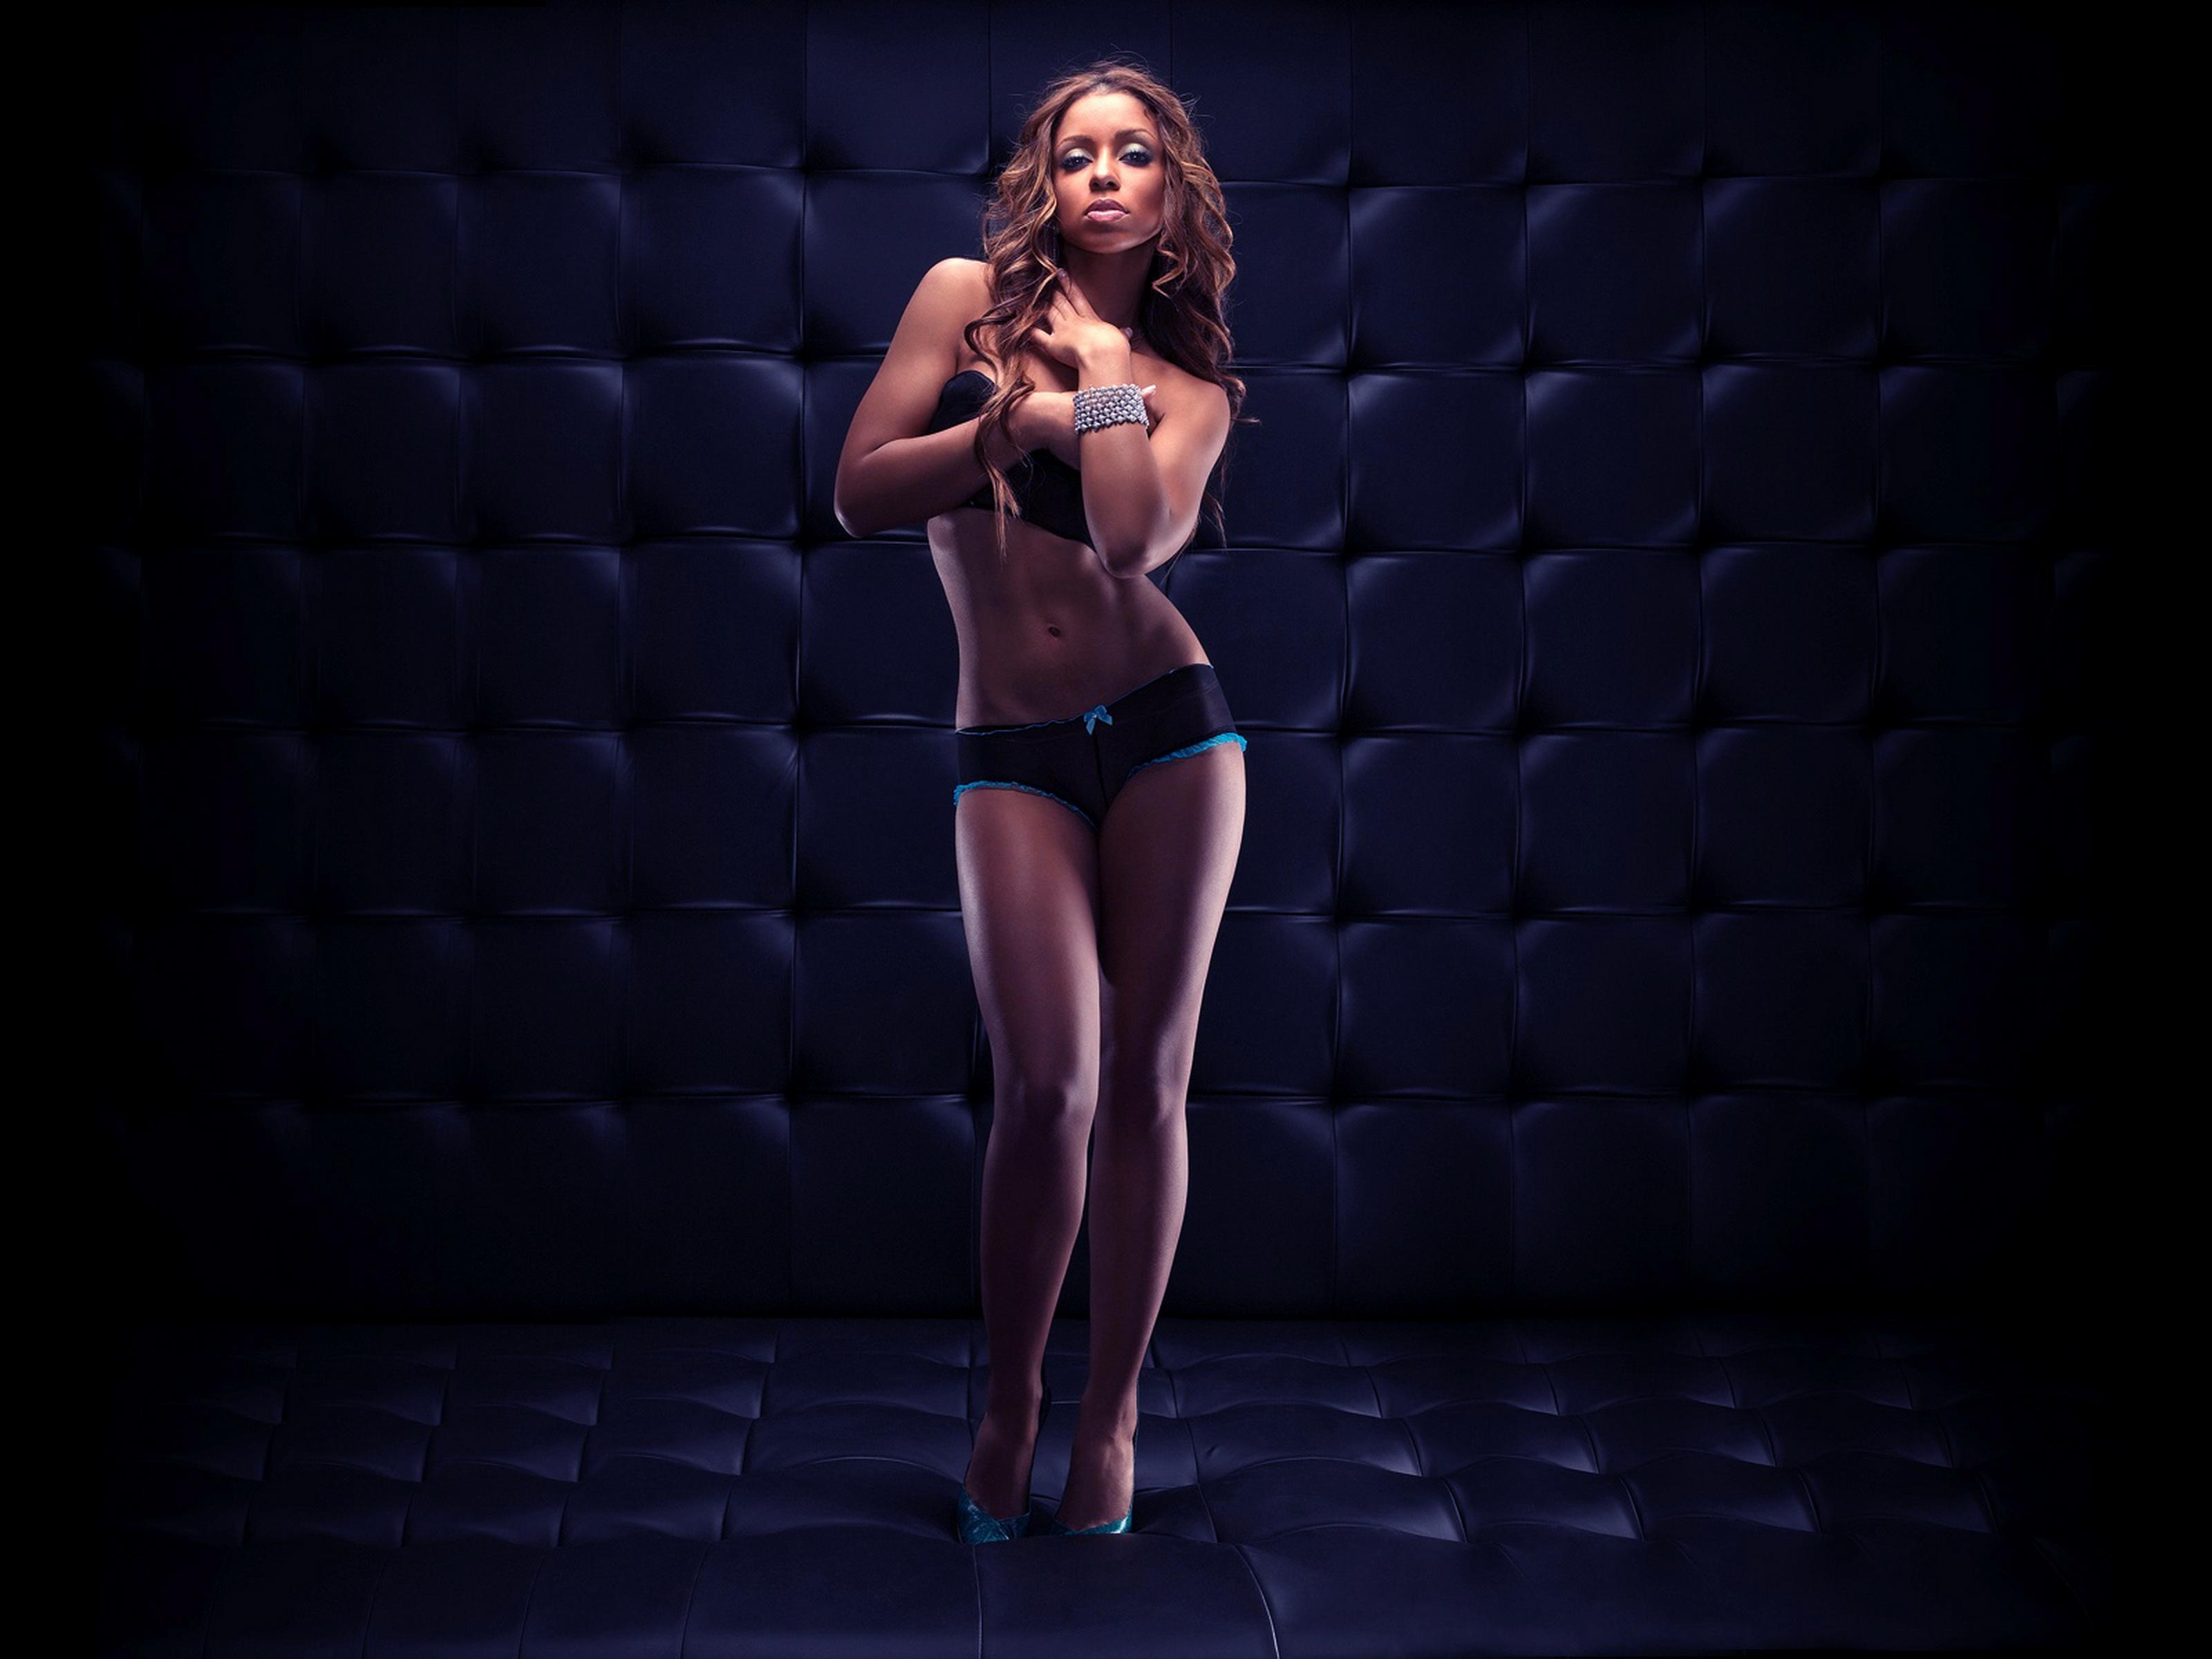 Француженка танцует у негра 5 фотография